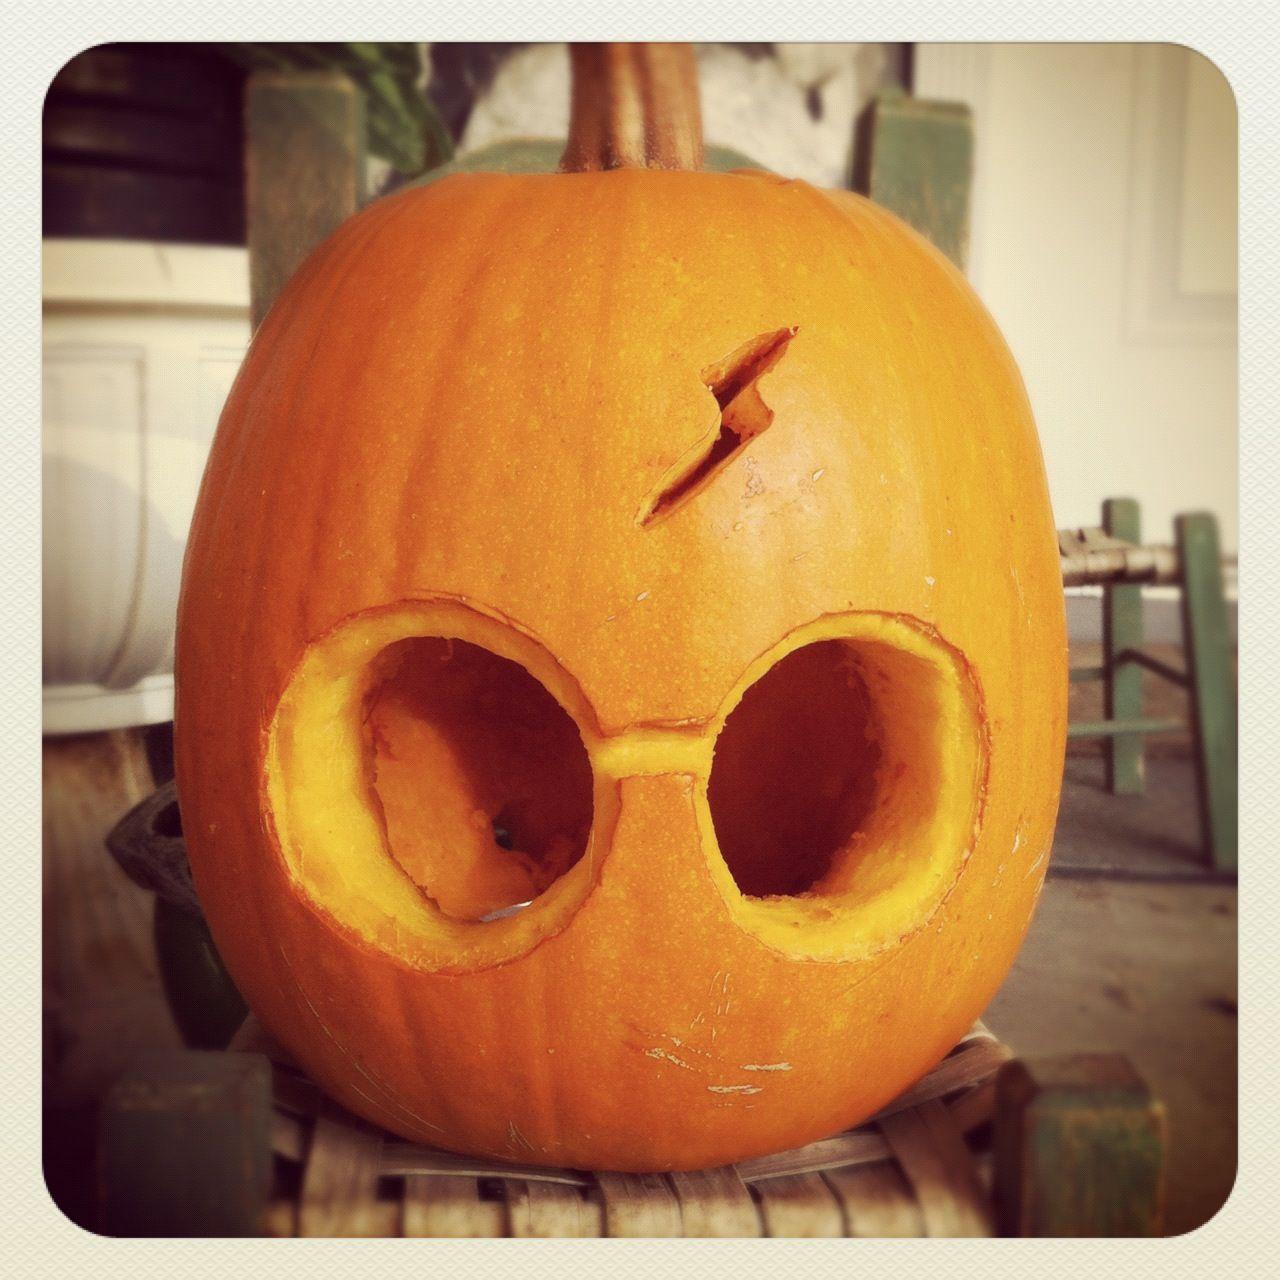 Harry potter pumpkin carving, by my sister Karina Monroy